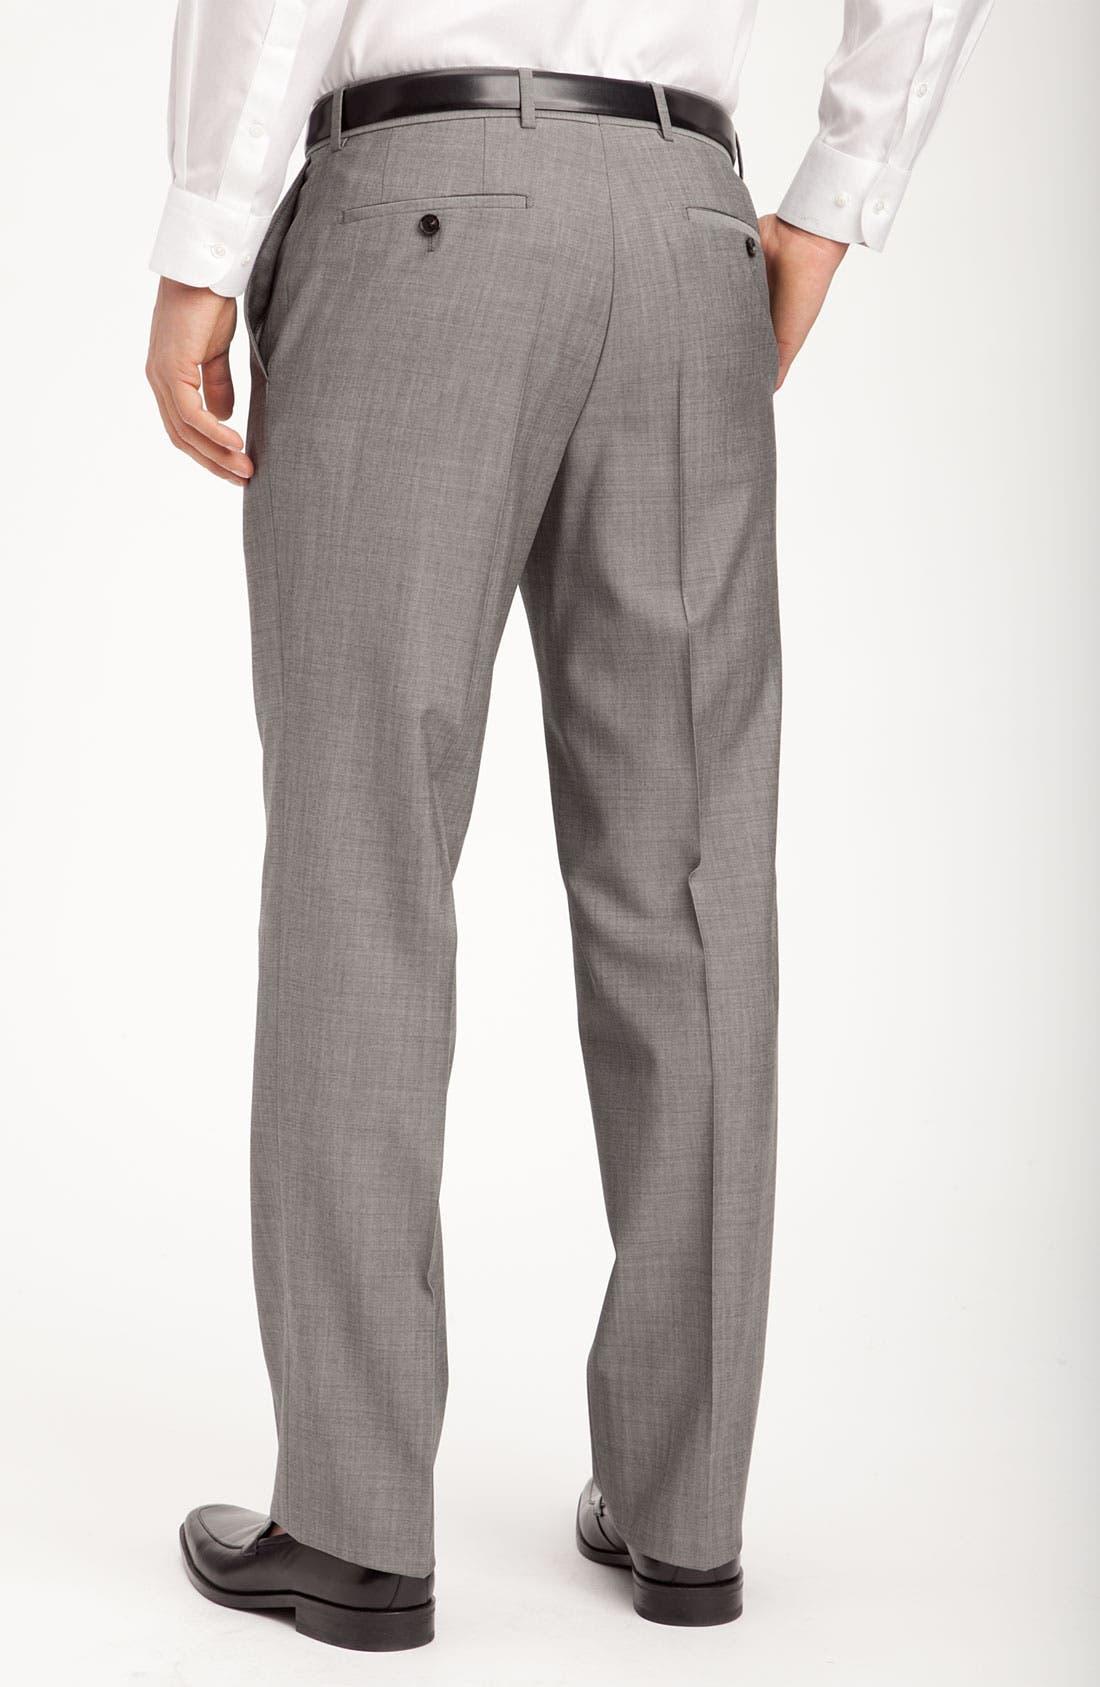 BOSS HUGO BOSS 'Jeffrey US' Flat Front Pinpoint Wool Trousers,                             Alternate thumbnail 3, color,                             022